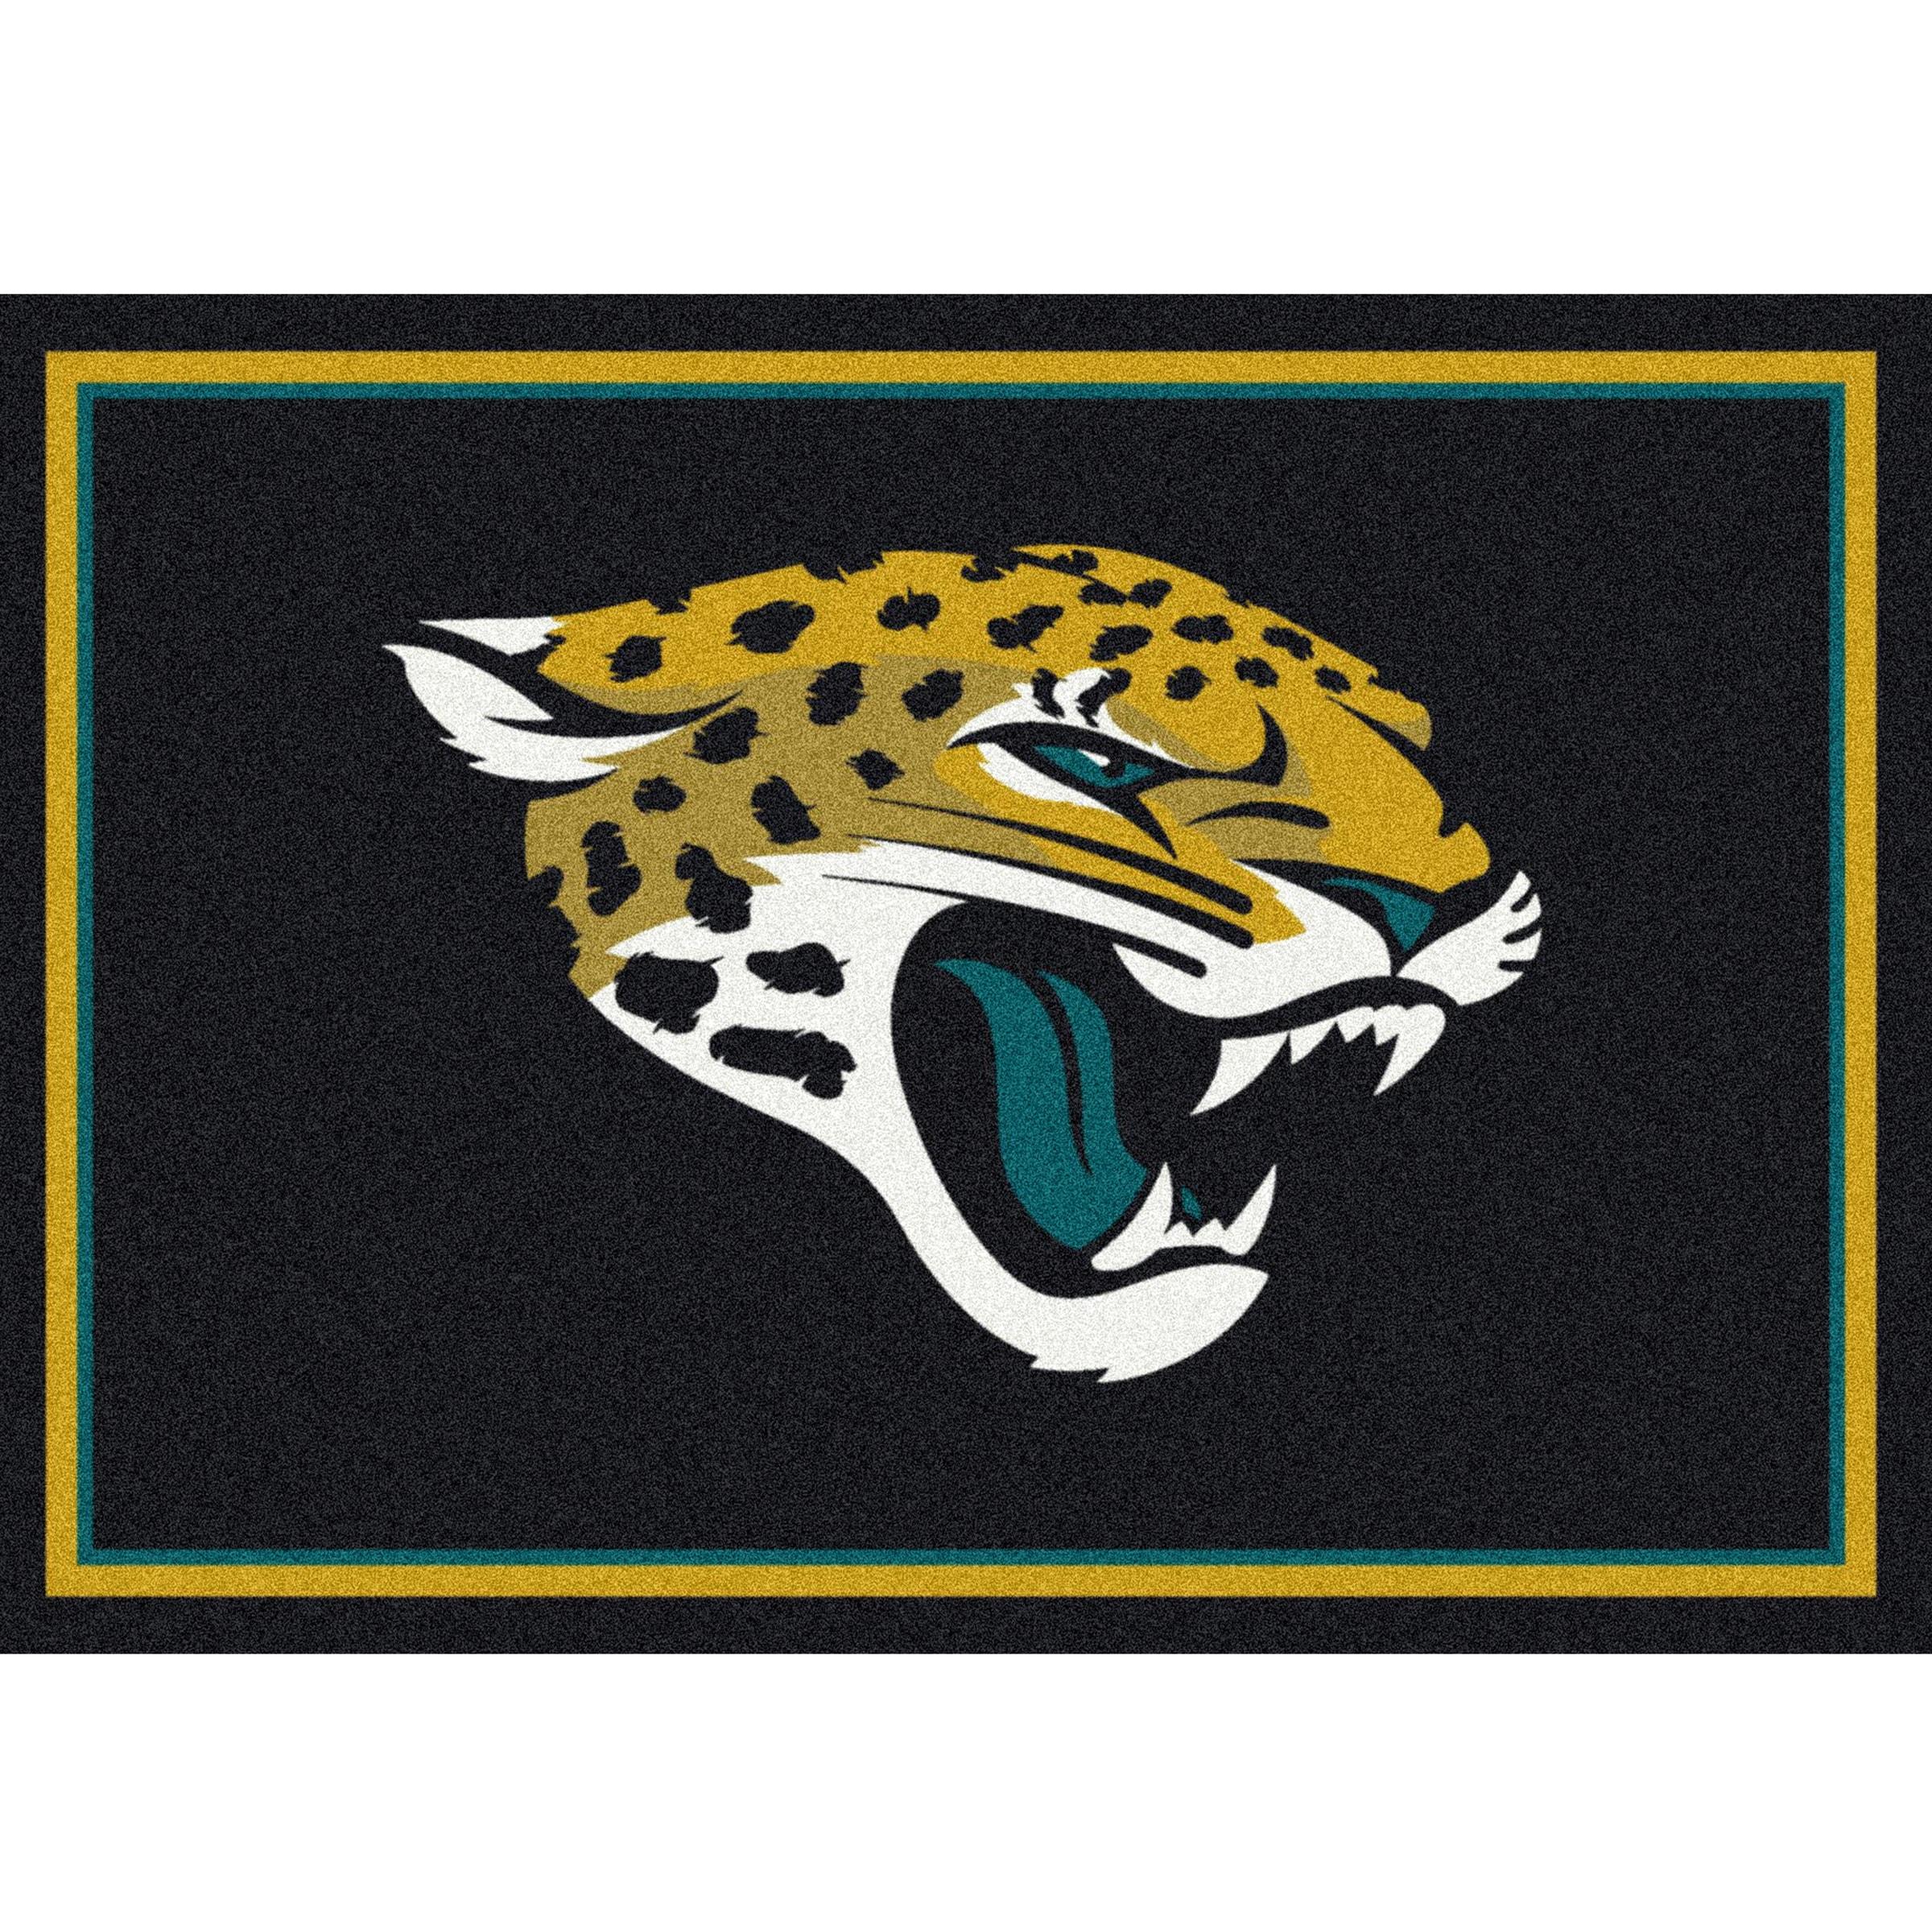 Jacksonville Jaguars Imperial 8' x 11' Spirit Rug